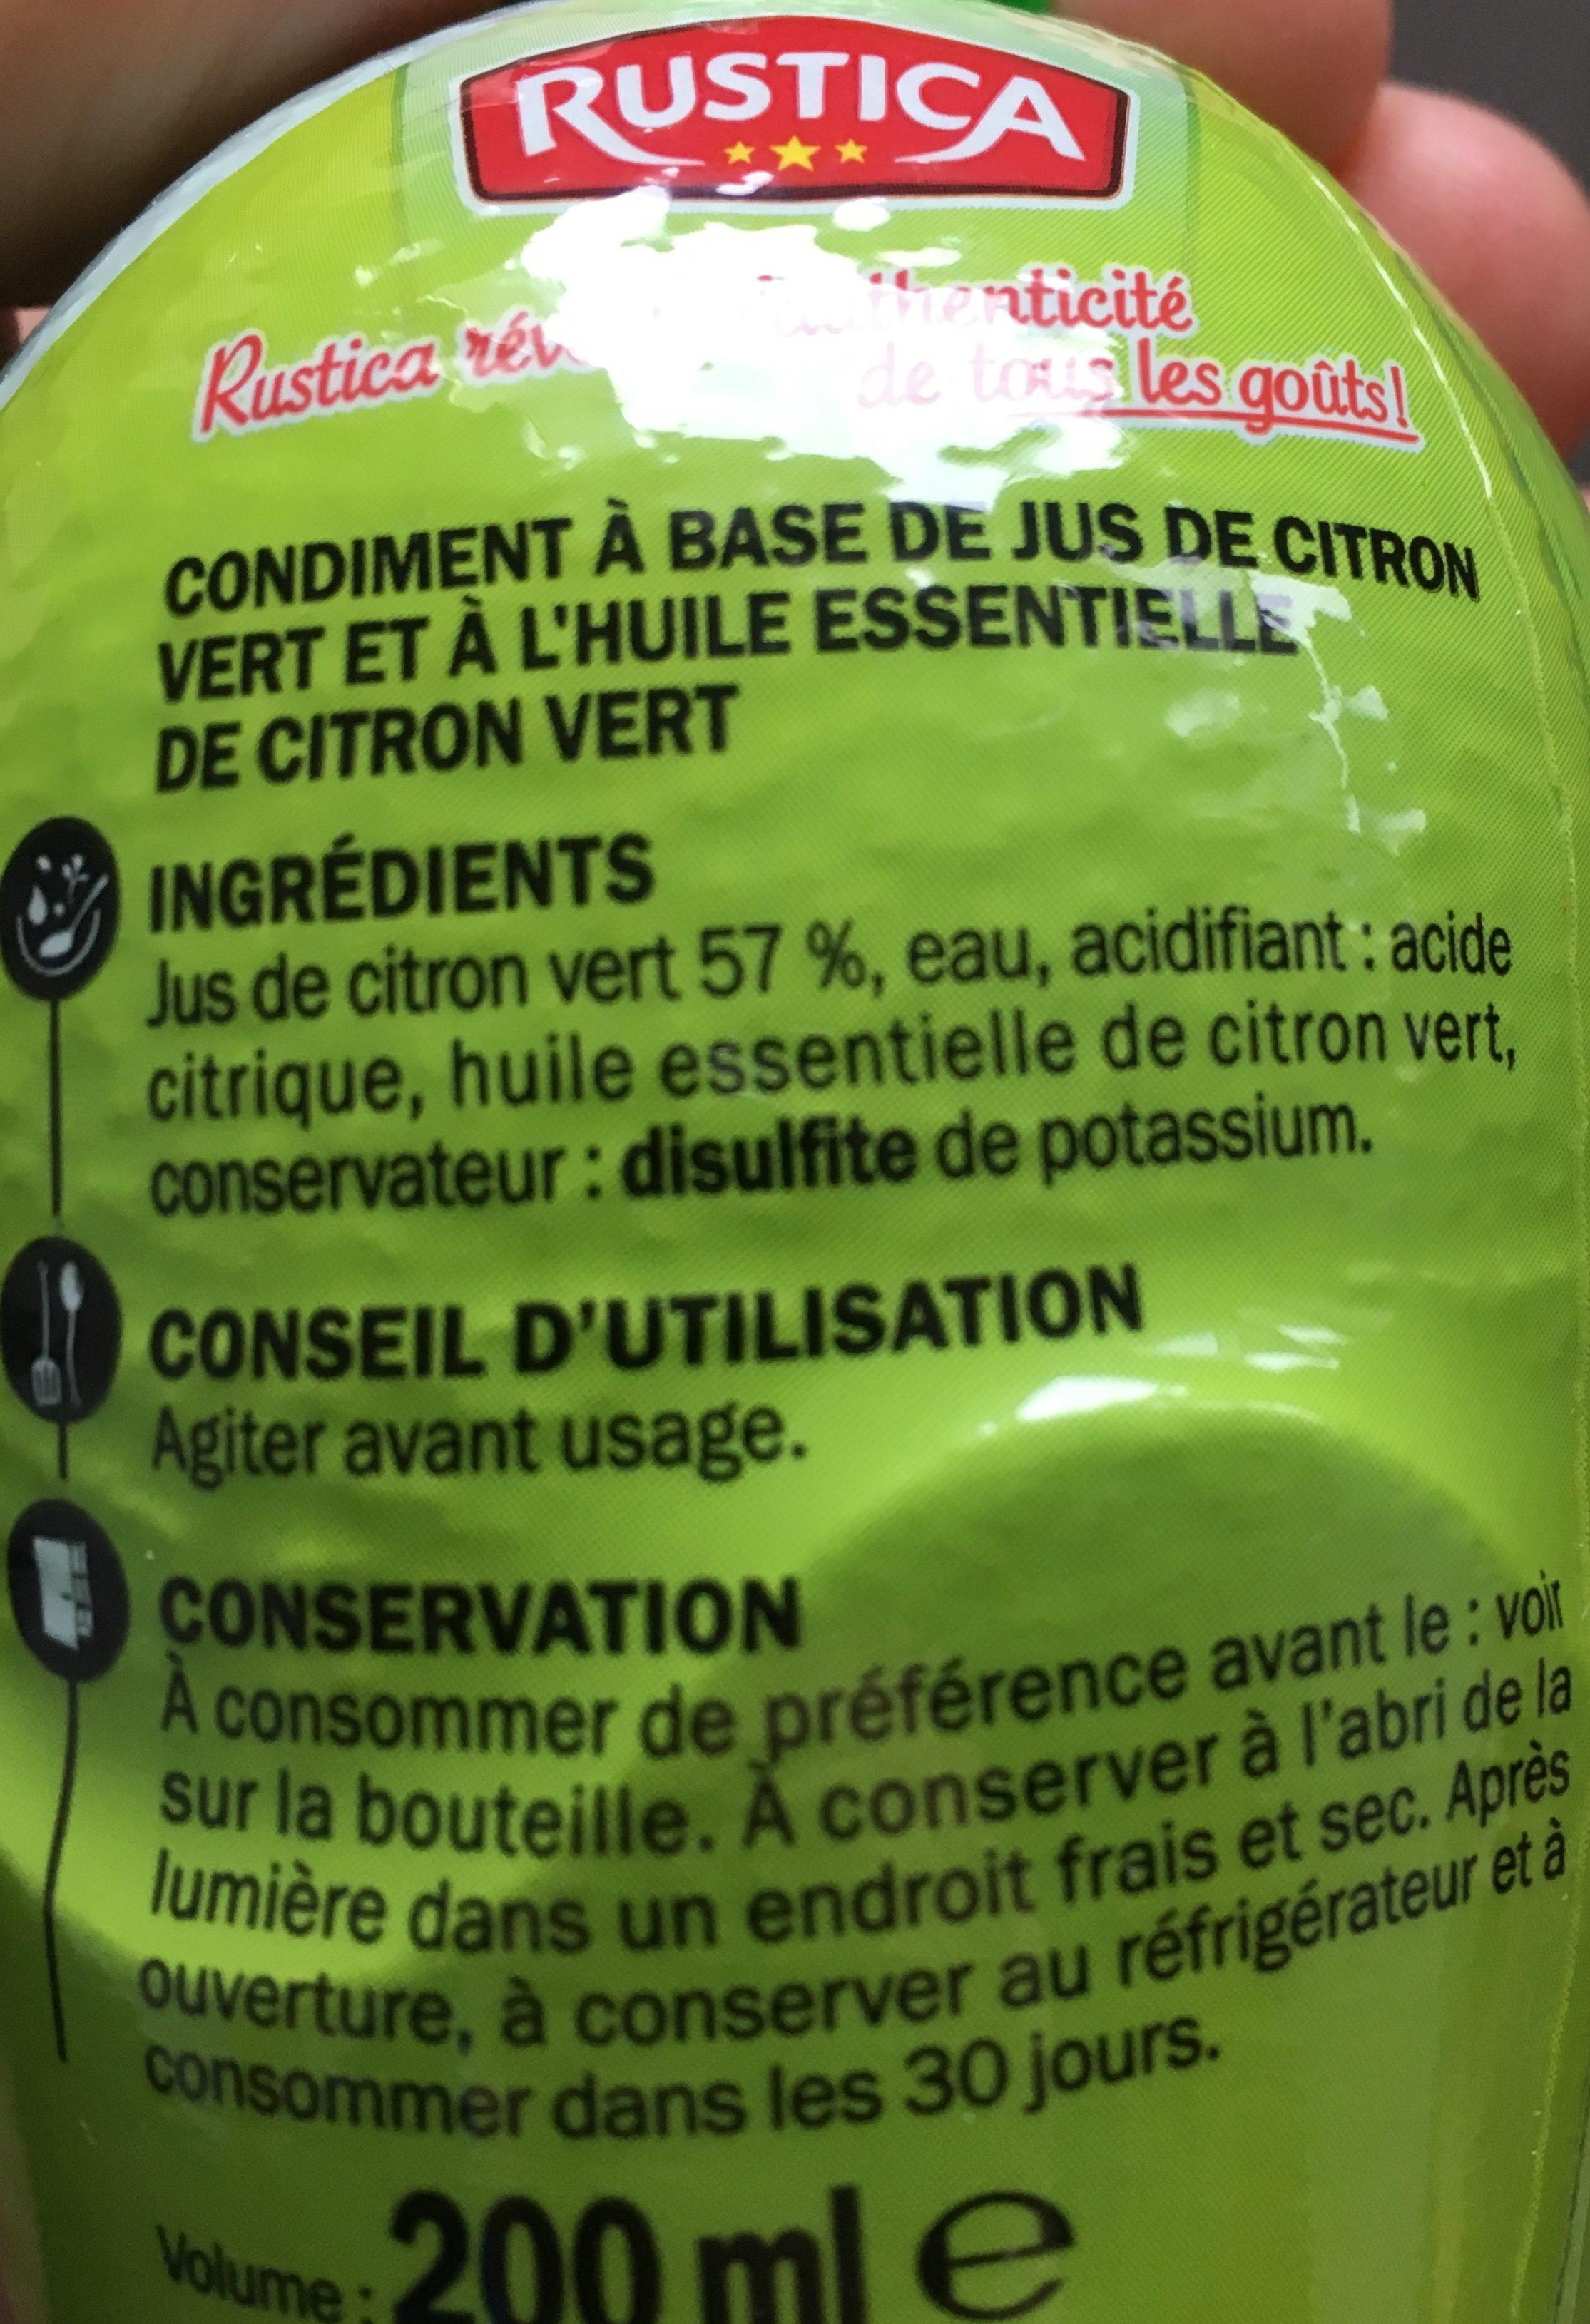 Citron Vert Rustica